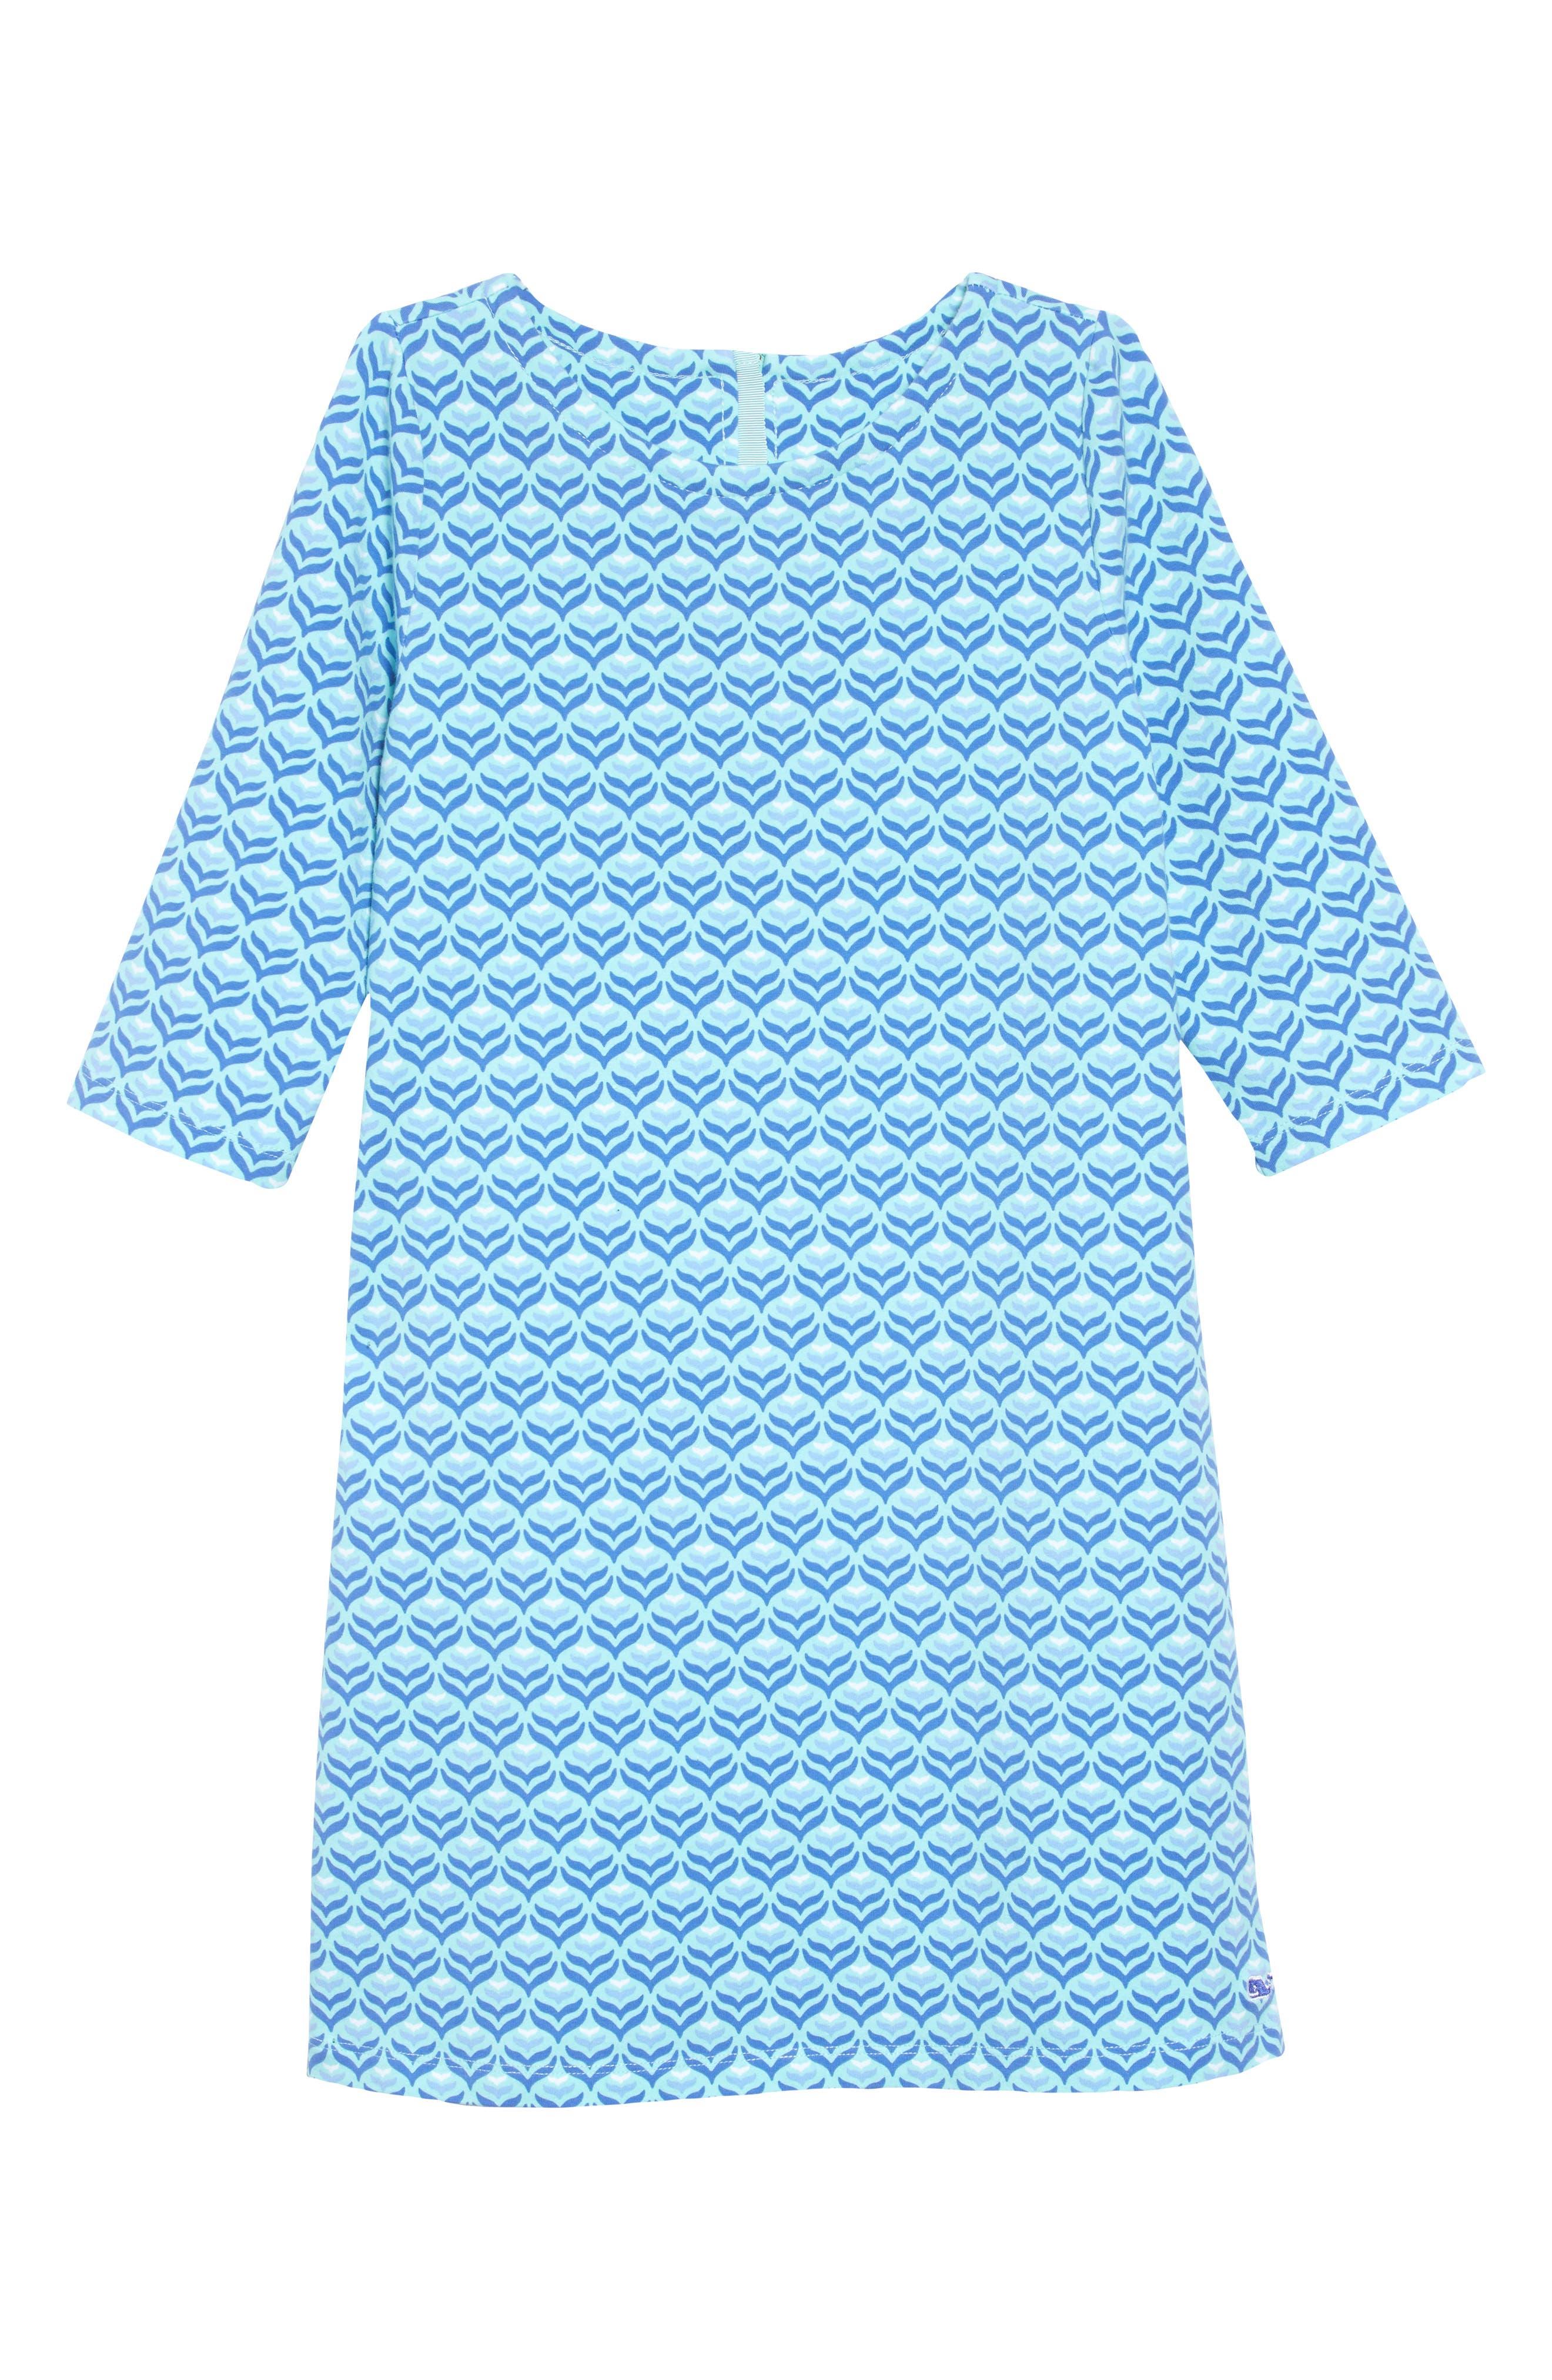 Diamond Whale Tale Shift Dress,                         Main,                         color, CAICOS